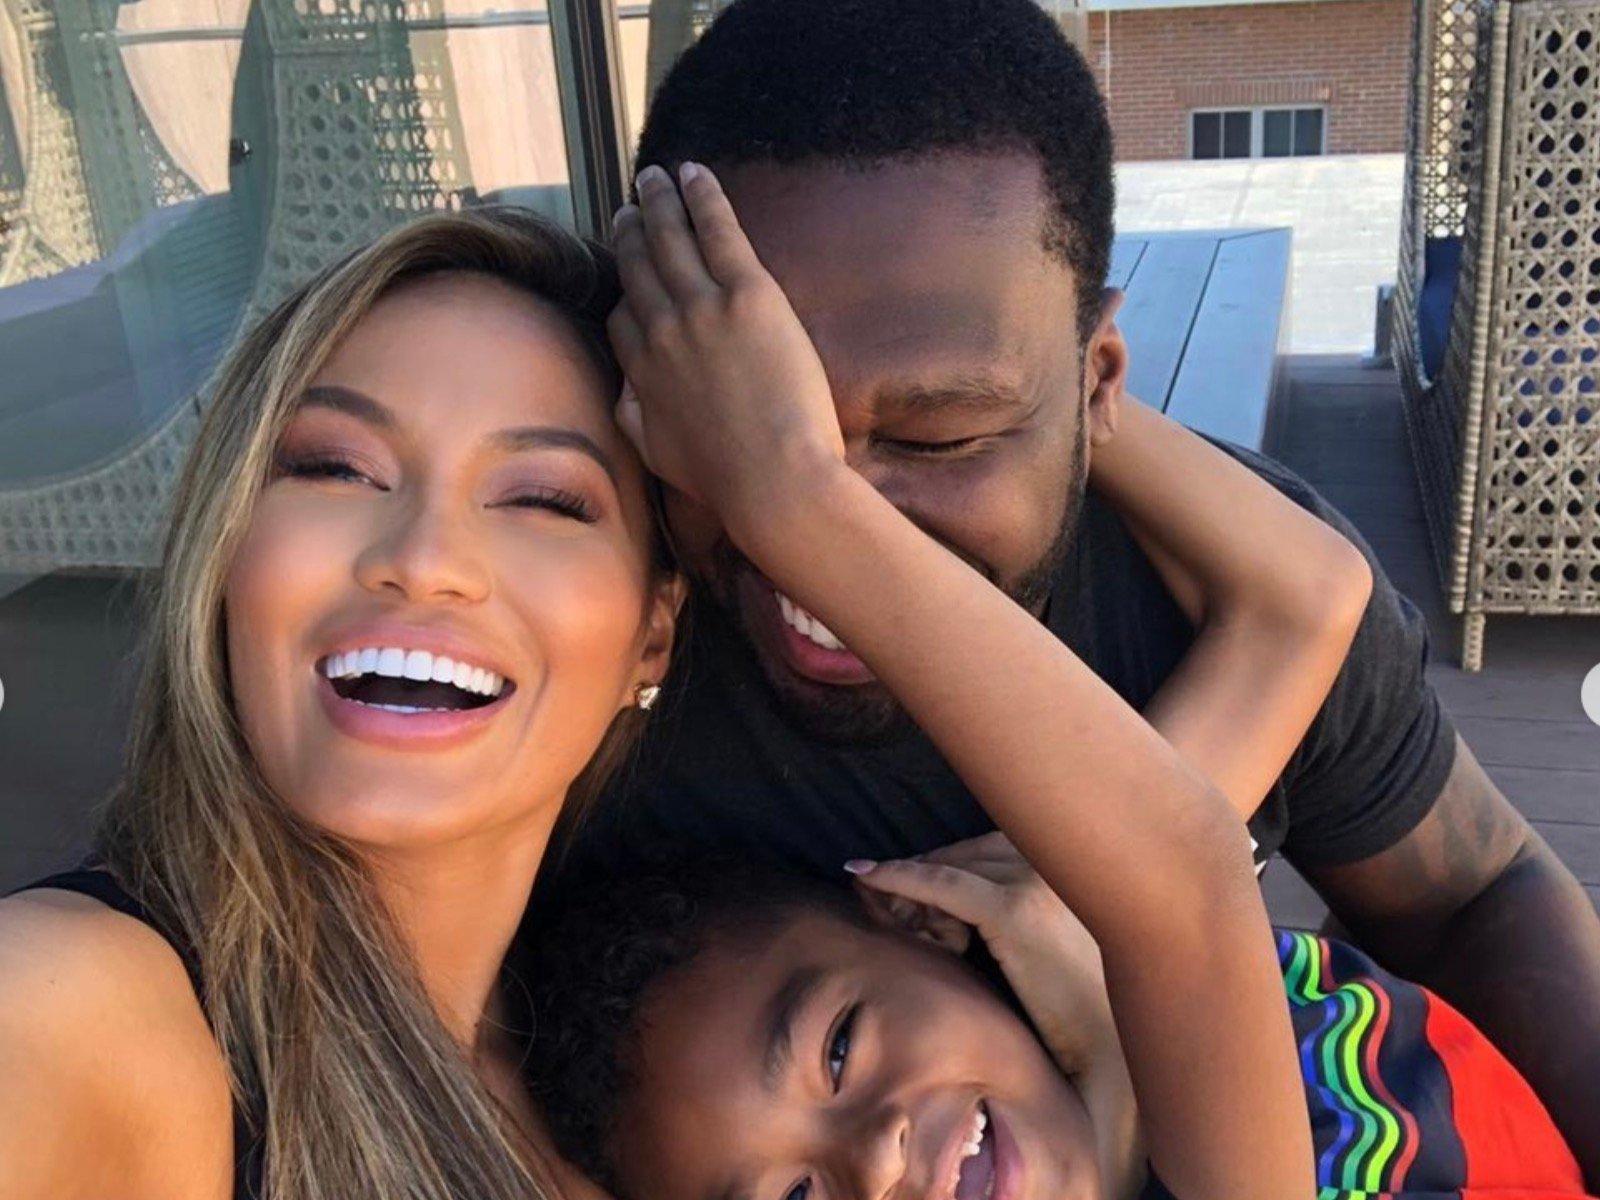 Daphne Joy 50 Cent Sire Jackson Selfie